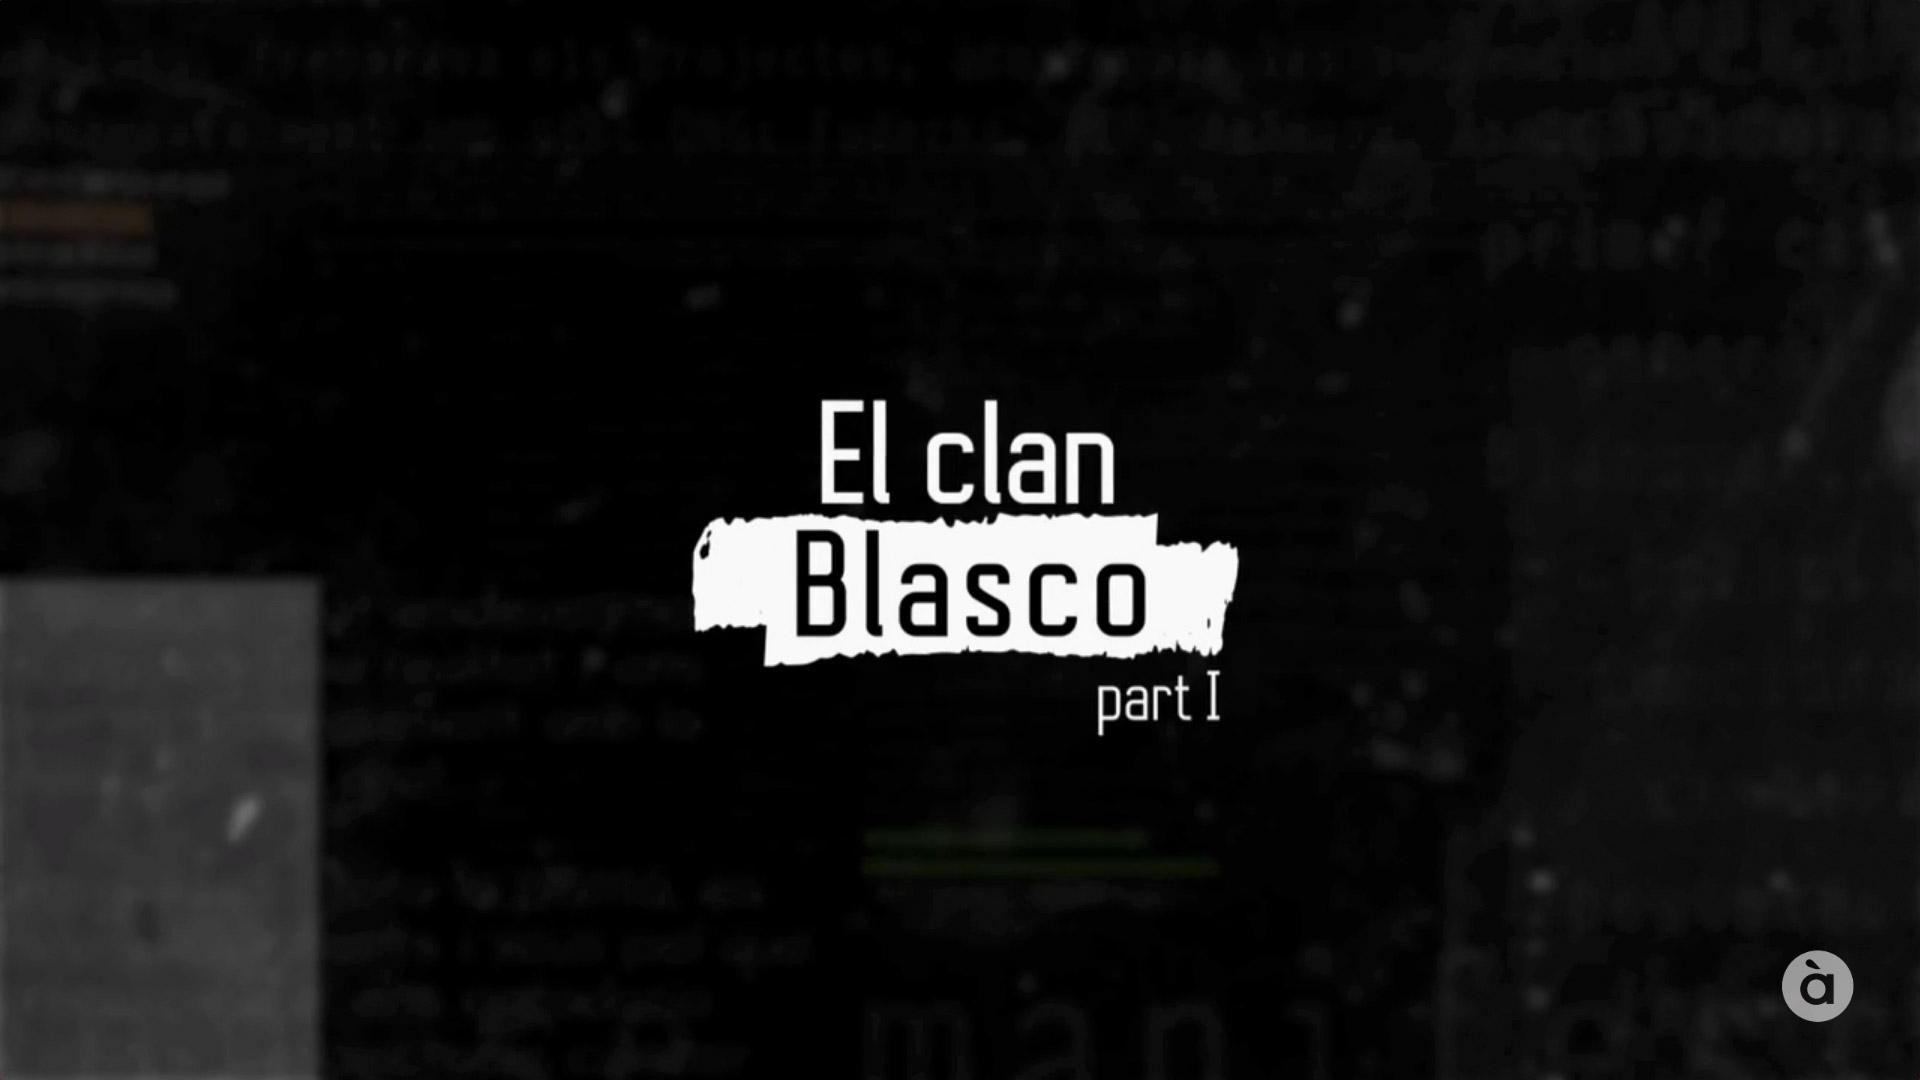 El Clan Blasco - Croniques Subterranies